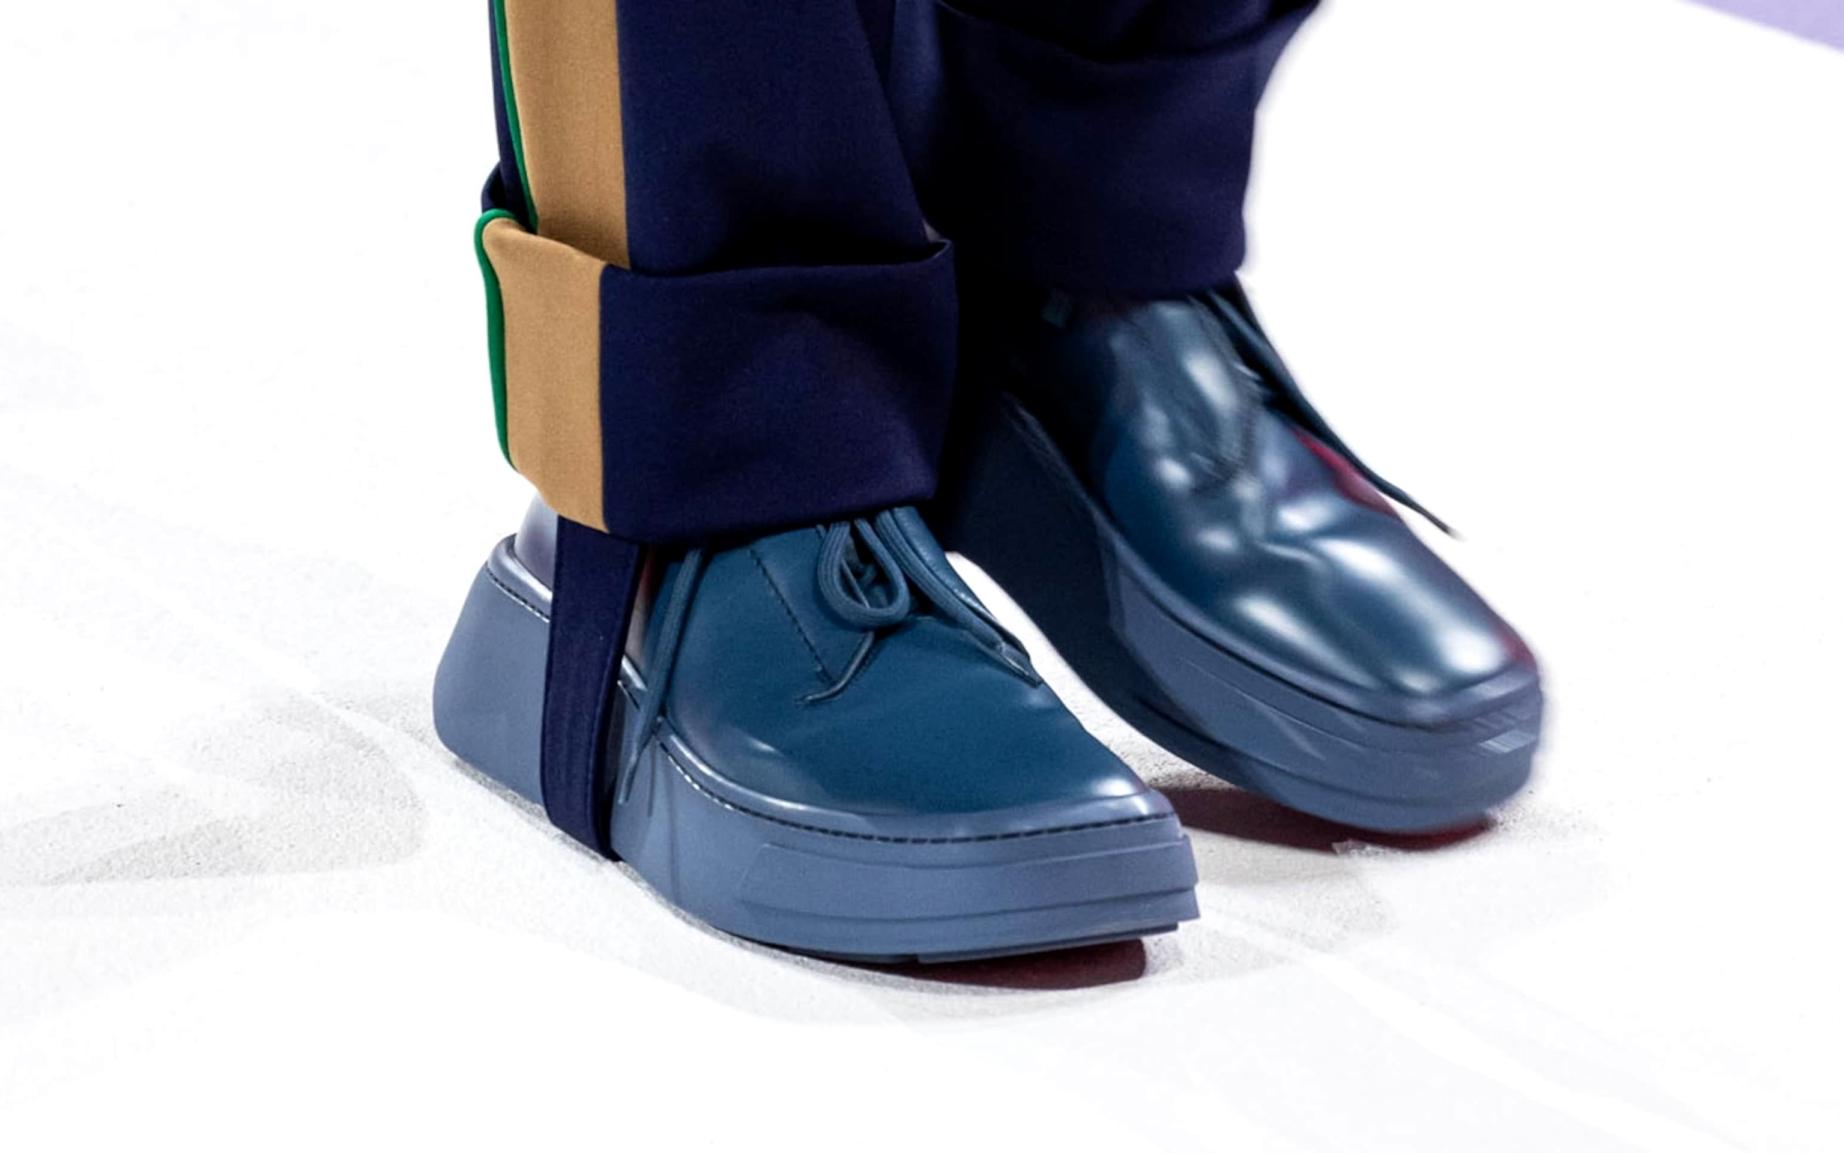 Обувь из коллекции Prada Fall/Winter 2020 Menswear